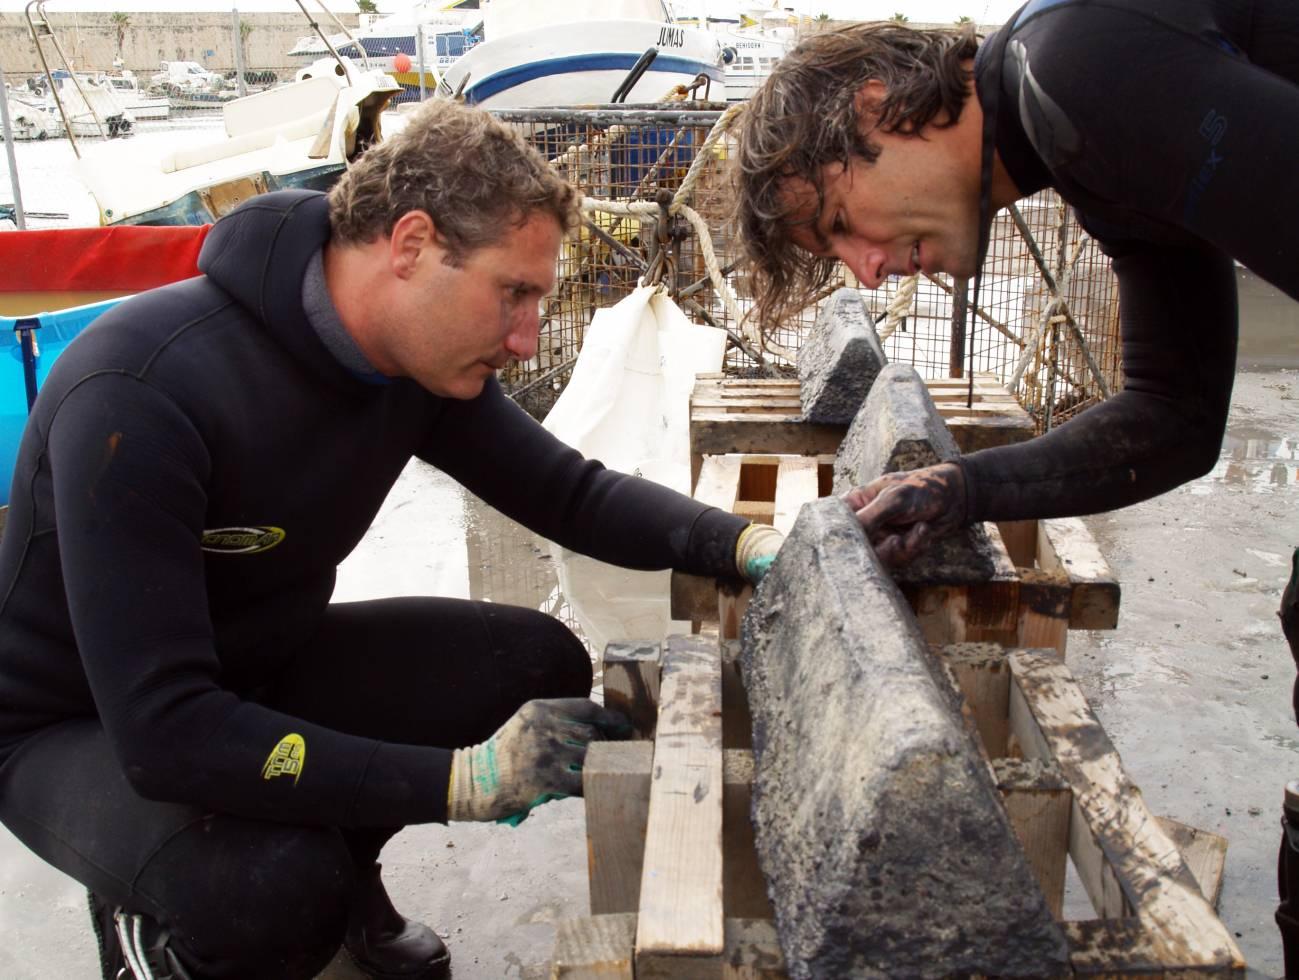 Buzos junto a un lingote extraído del agua. / Dirección General de Cultura de la Generalitat Valenciana